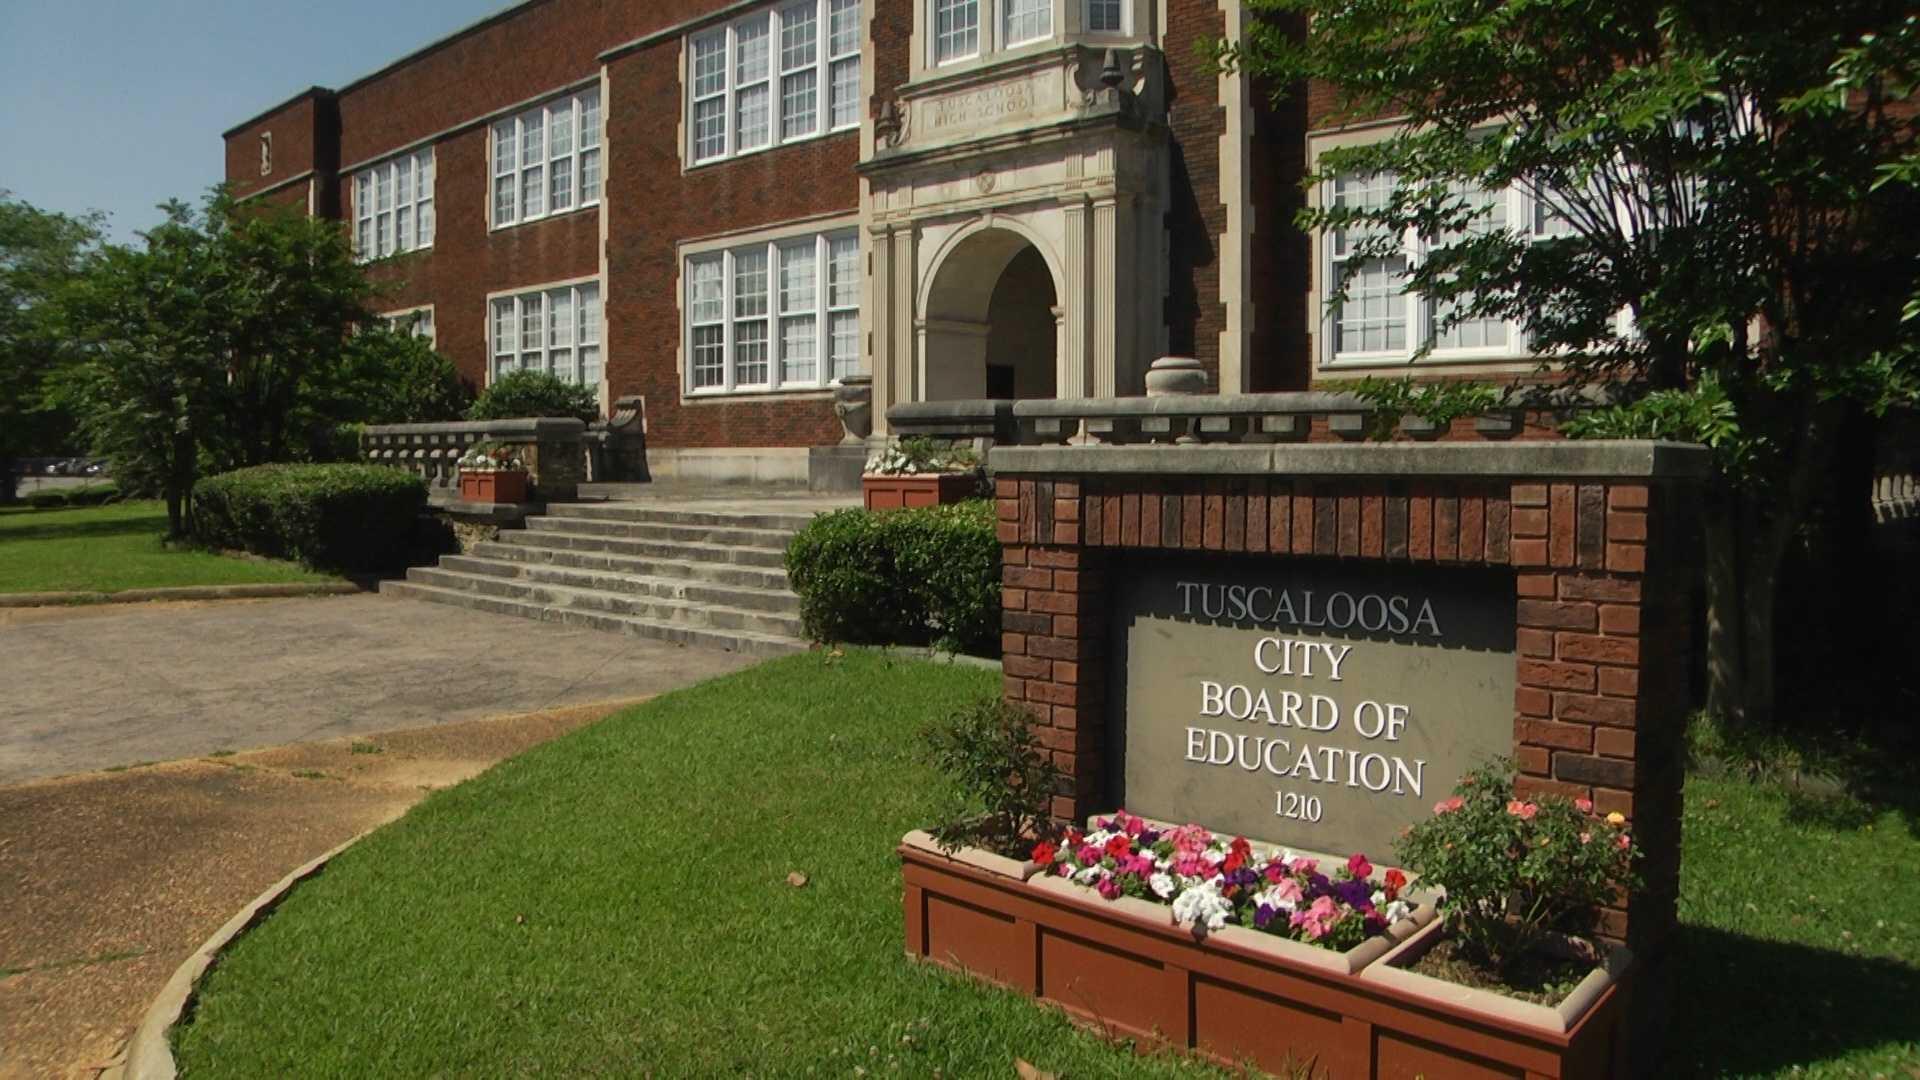 Tuscaloosa City Schools 2016.jpg